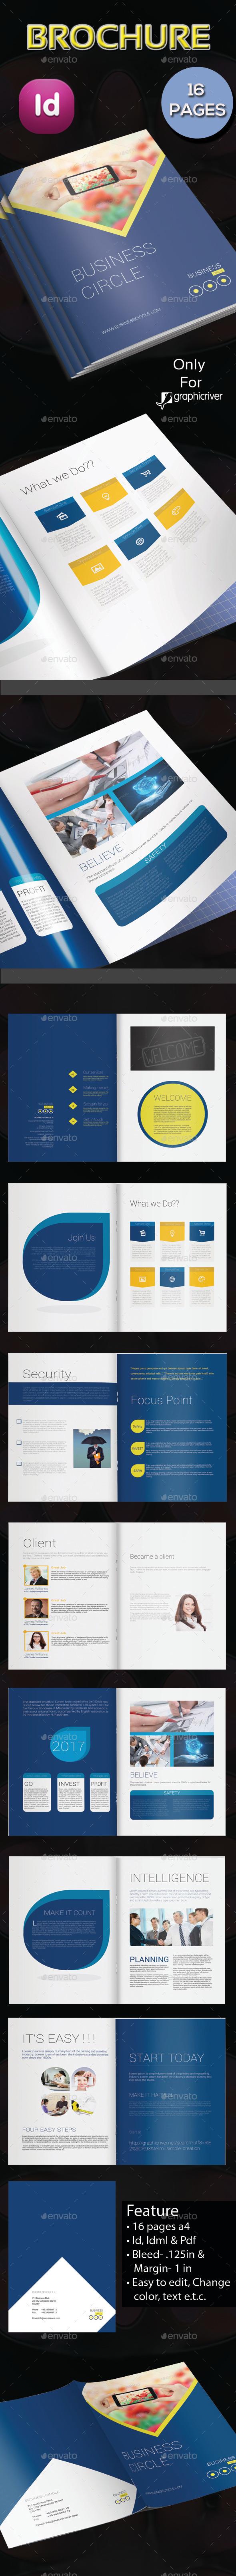 GraphicRiver Business Brochure 04 10285197